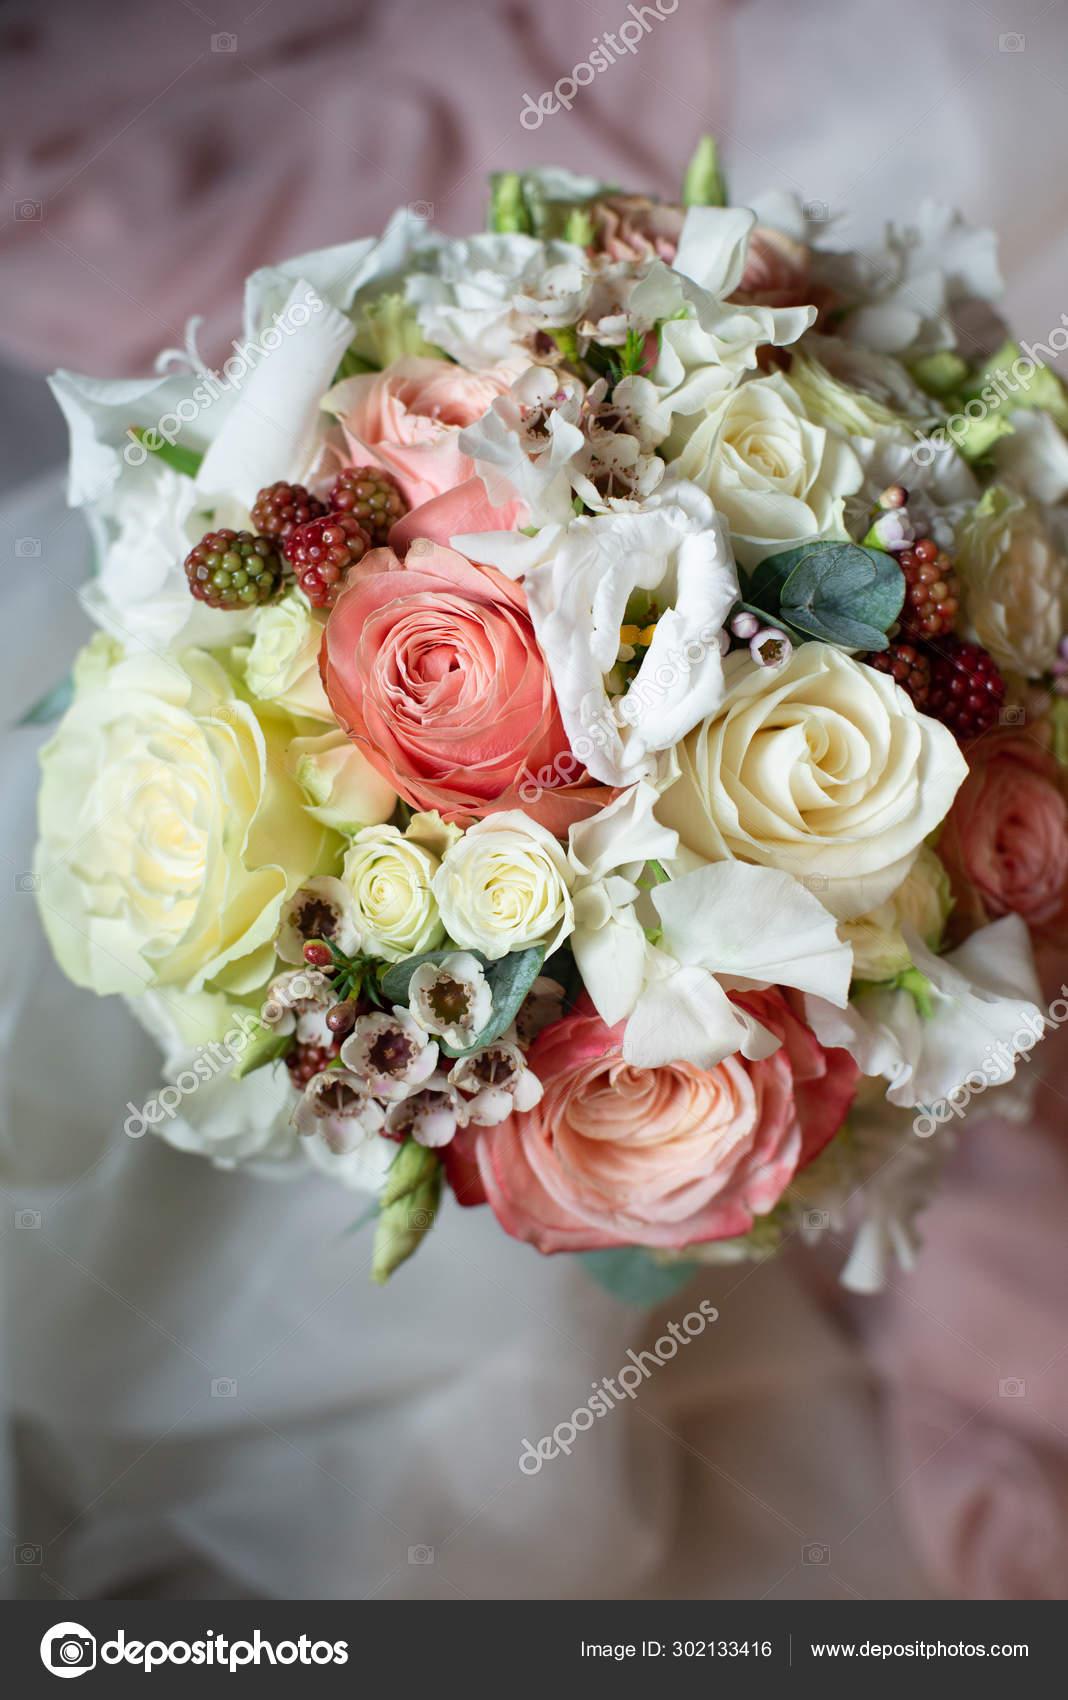 Most Beautiful Bouquet Flowers Anemone Rose Ranunculus Mattiola Tulip Eucalyptus Stock Photo Image By C Plan905 302133416